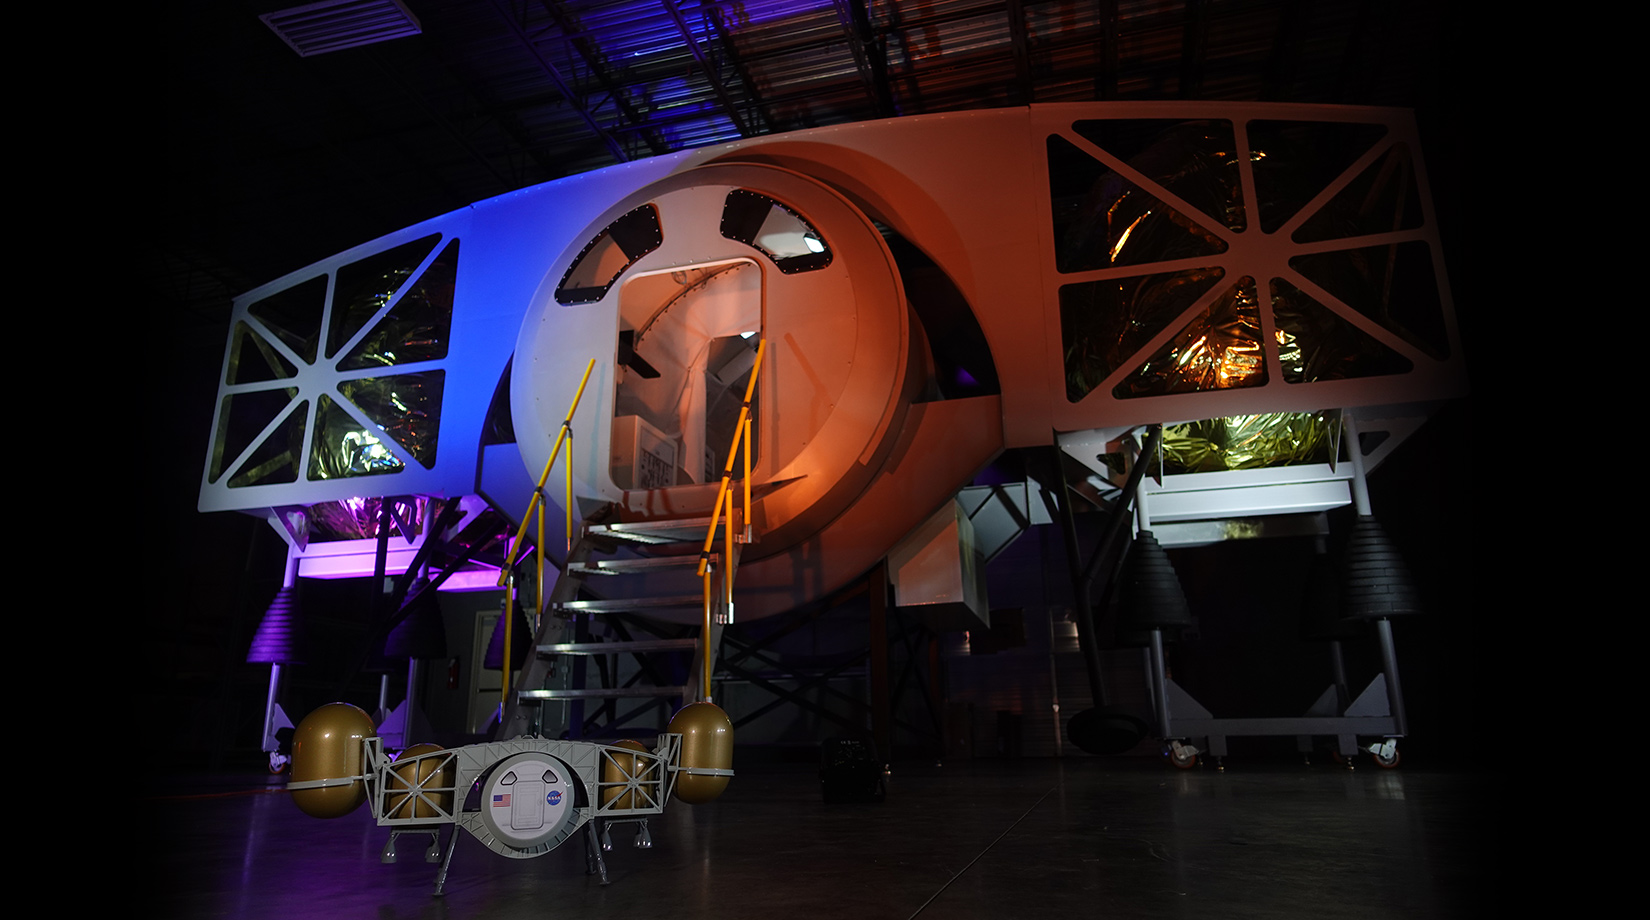 Лунный посадочный модуль Dynetics